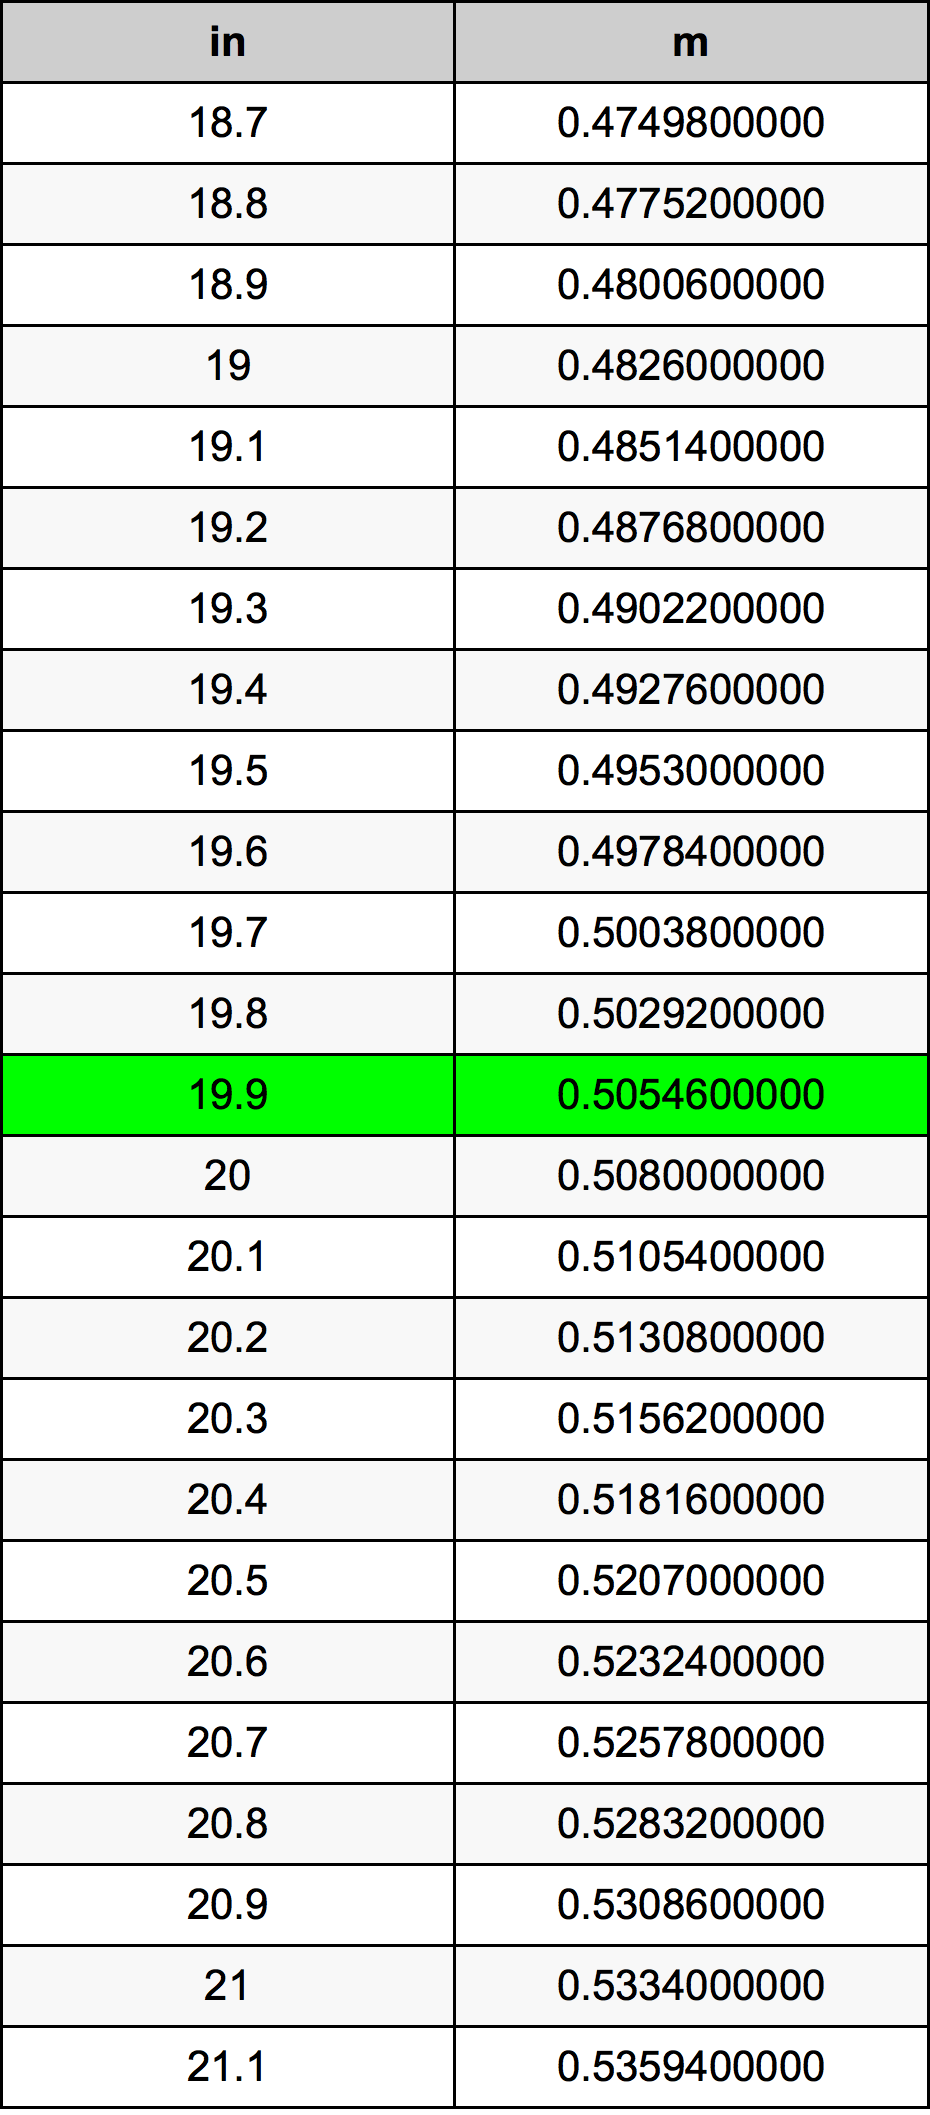 19.9 इंच रूपांतरण सारणी